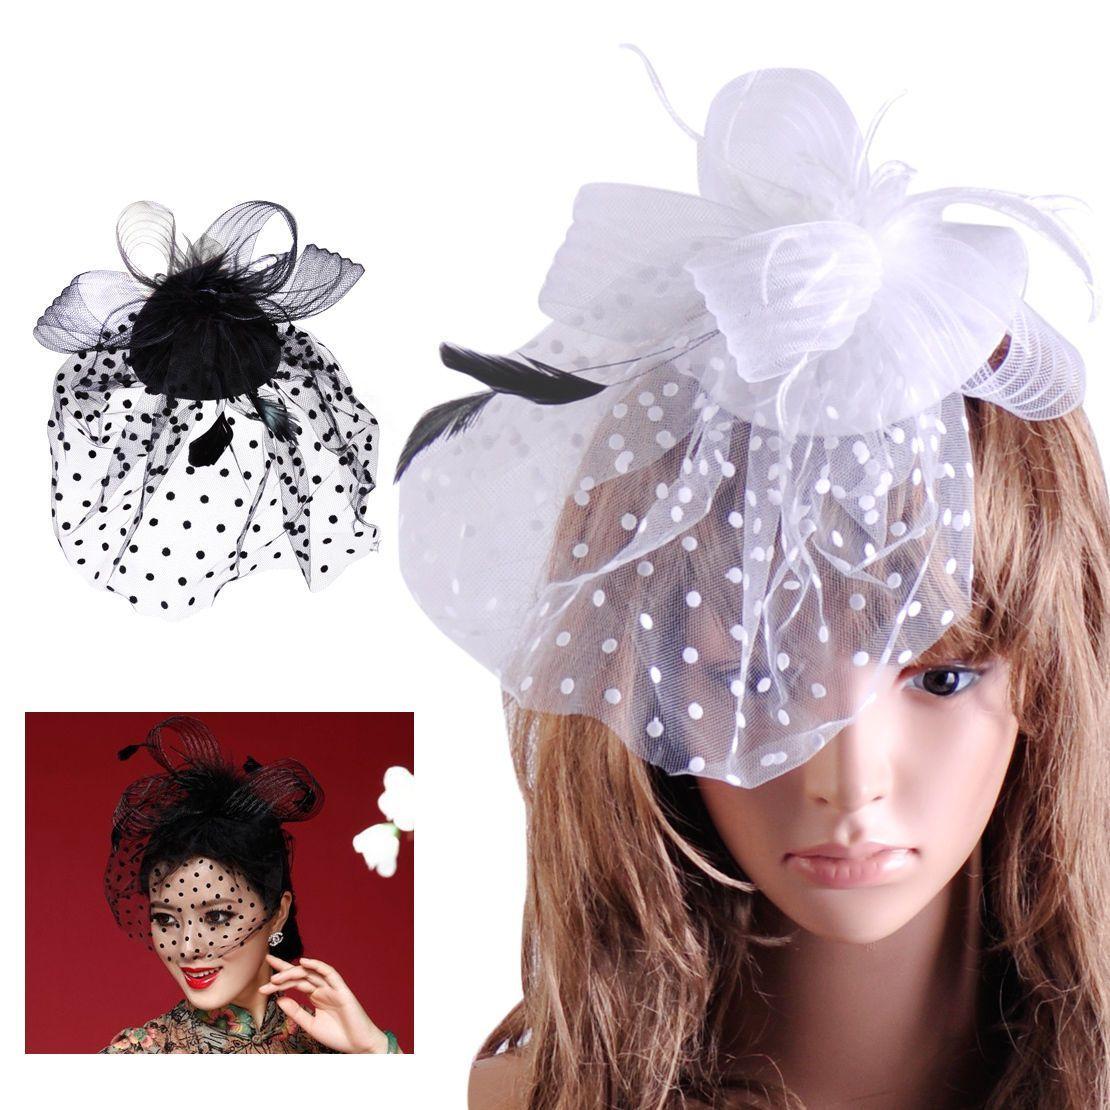 c89396a971783 Lady Top Net Mesh Hat Fascinator Hair Clip Wedding Church Party Veil Feather